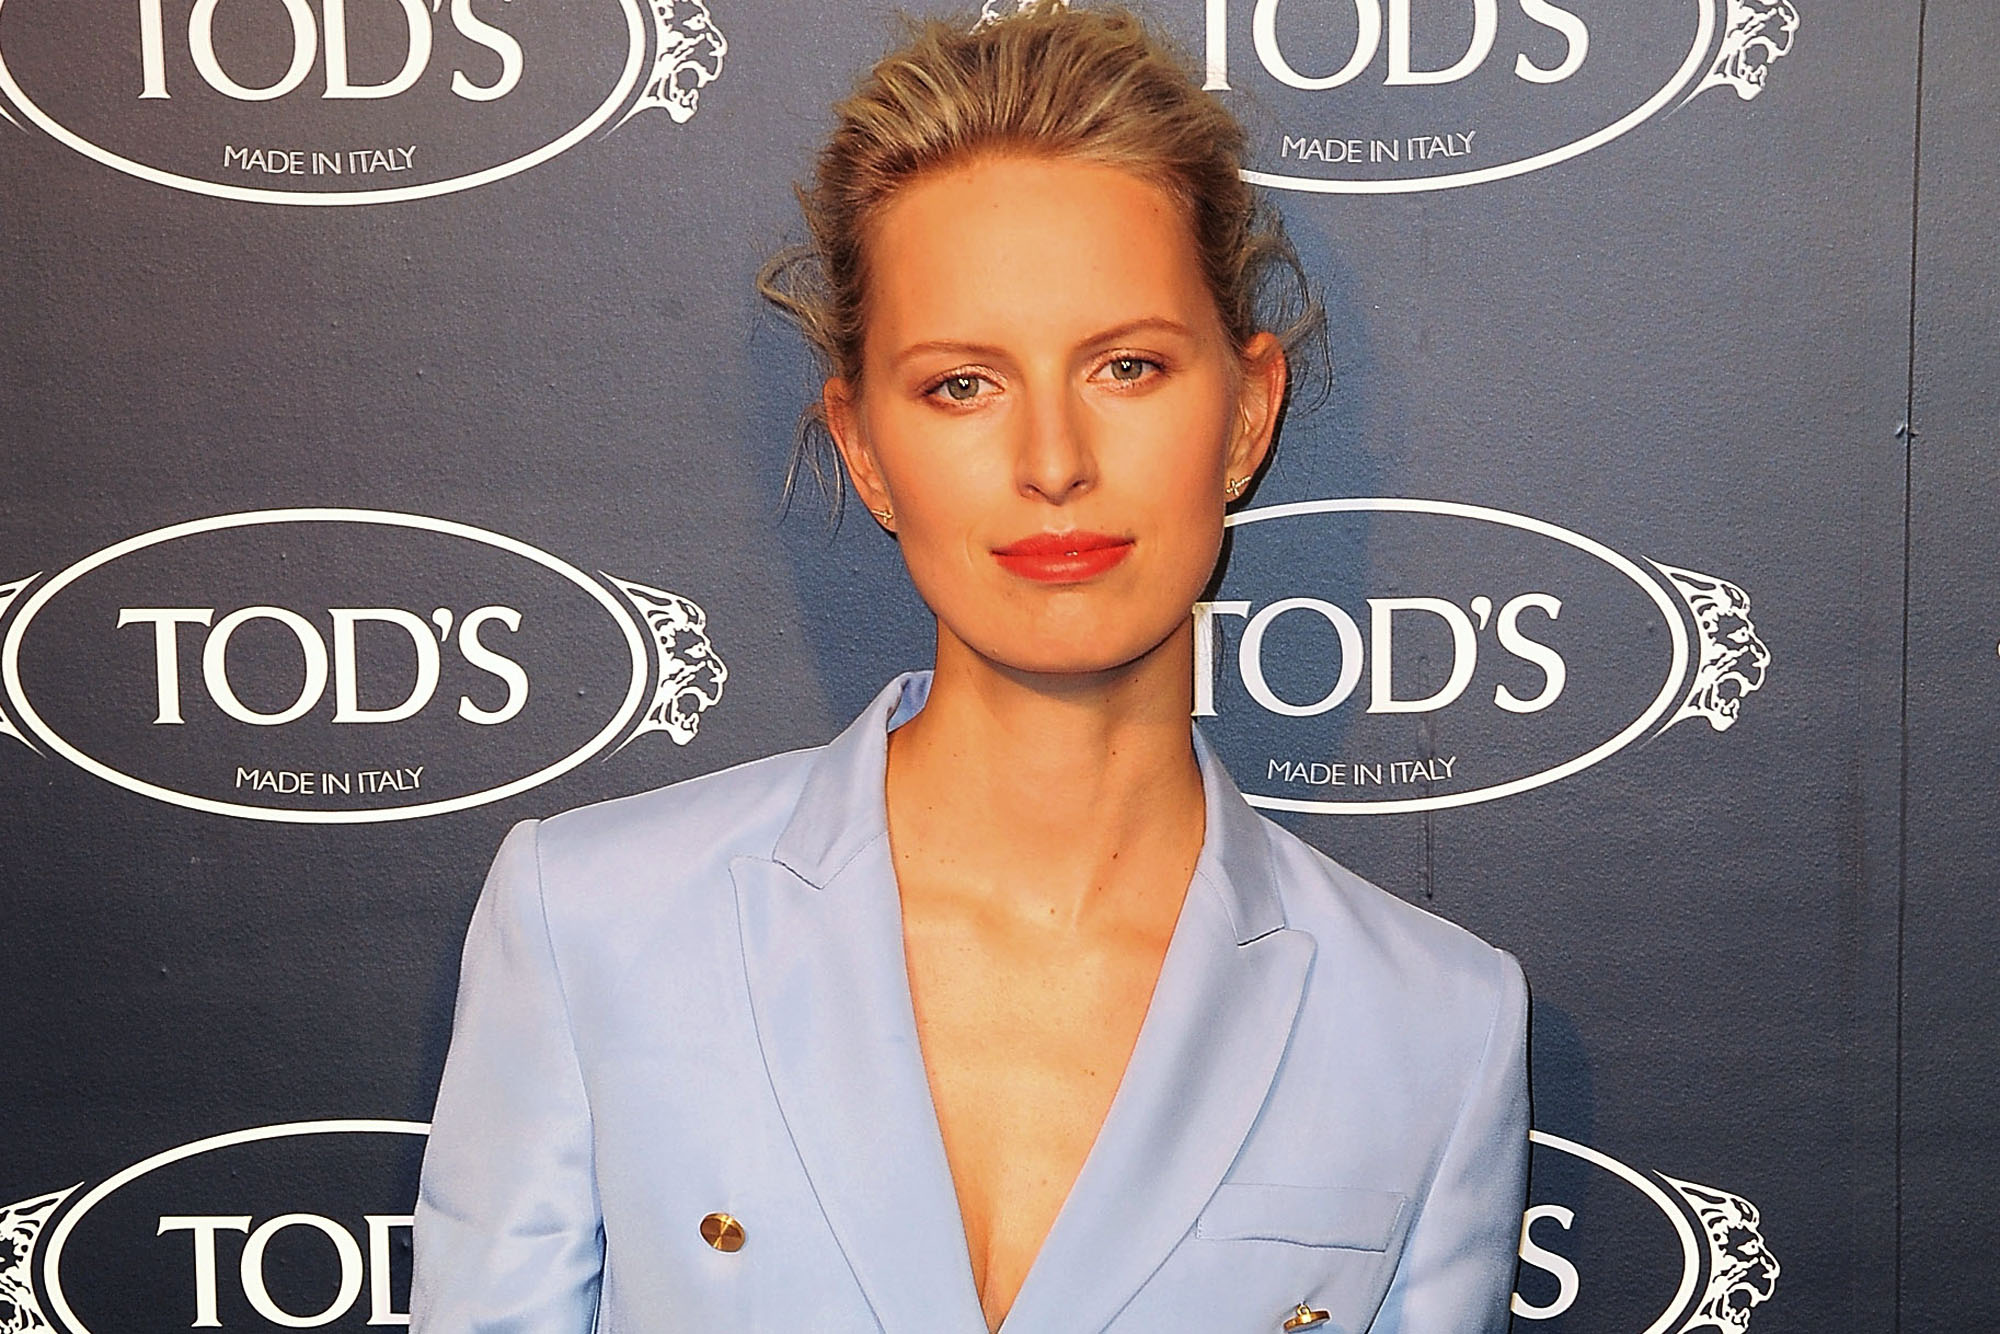 Karolina Kurkova reveals the fashion trend she can't stand